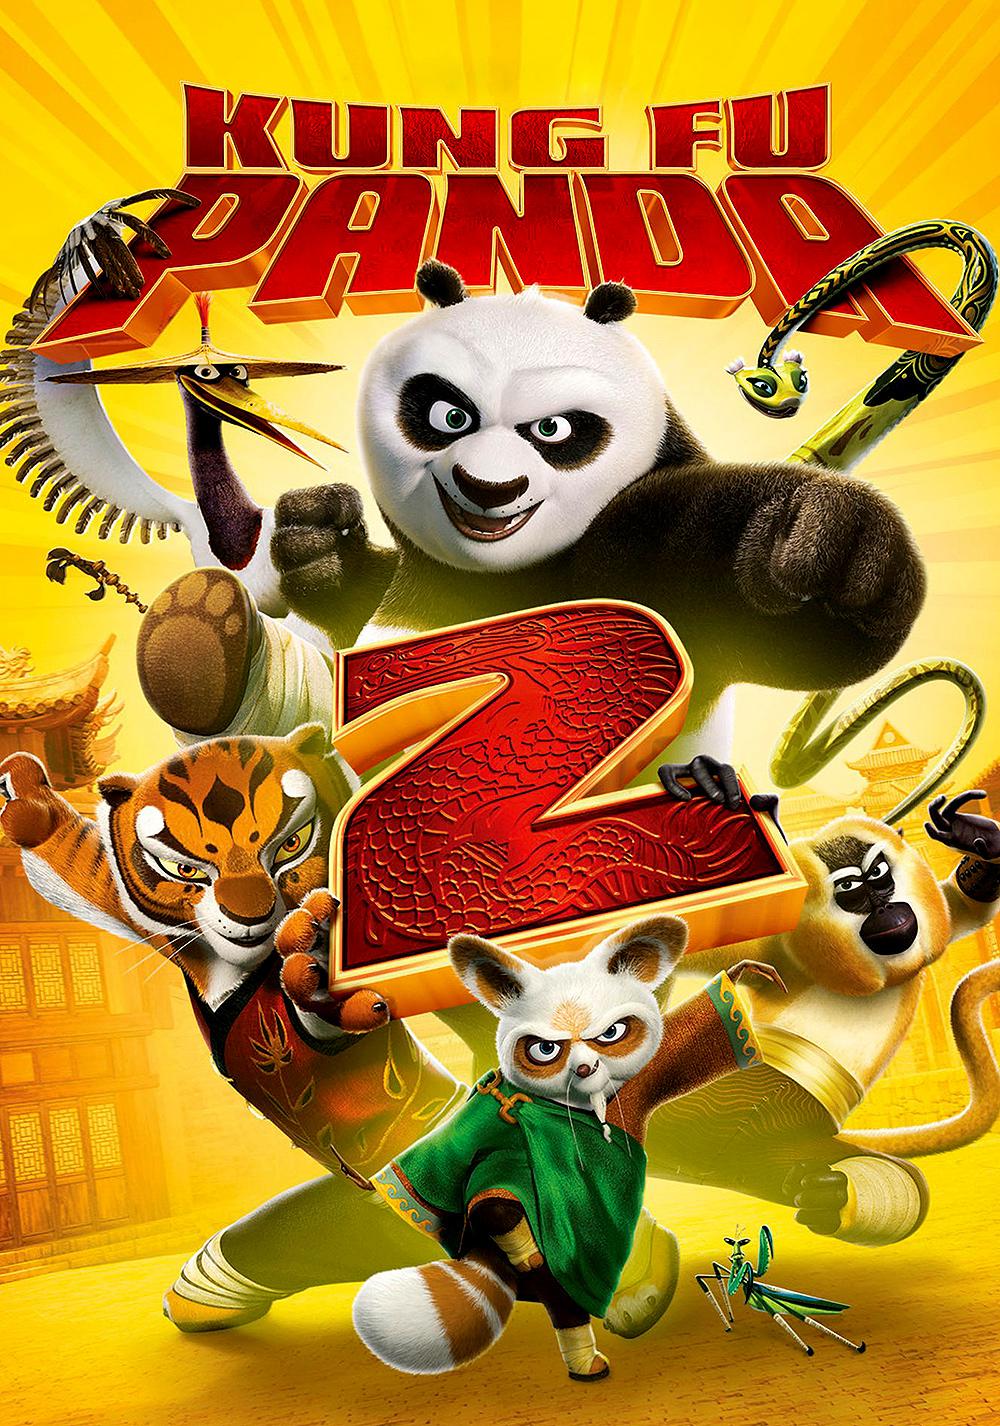 Kung fu panda 2 movie desktoomputer hd wallpaper image for ipad.